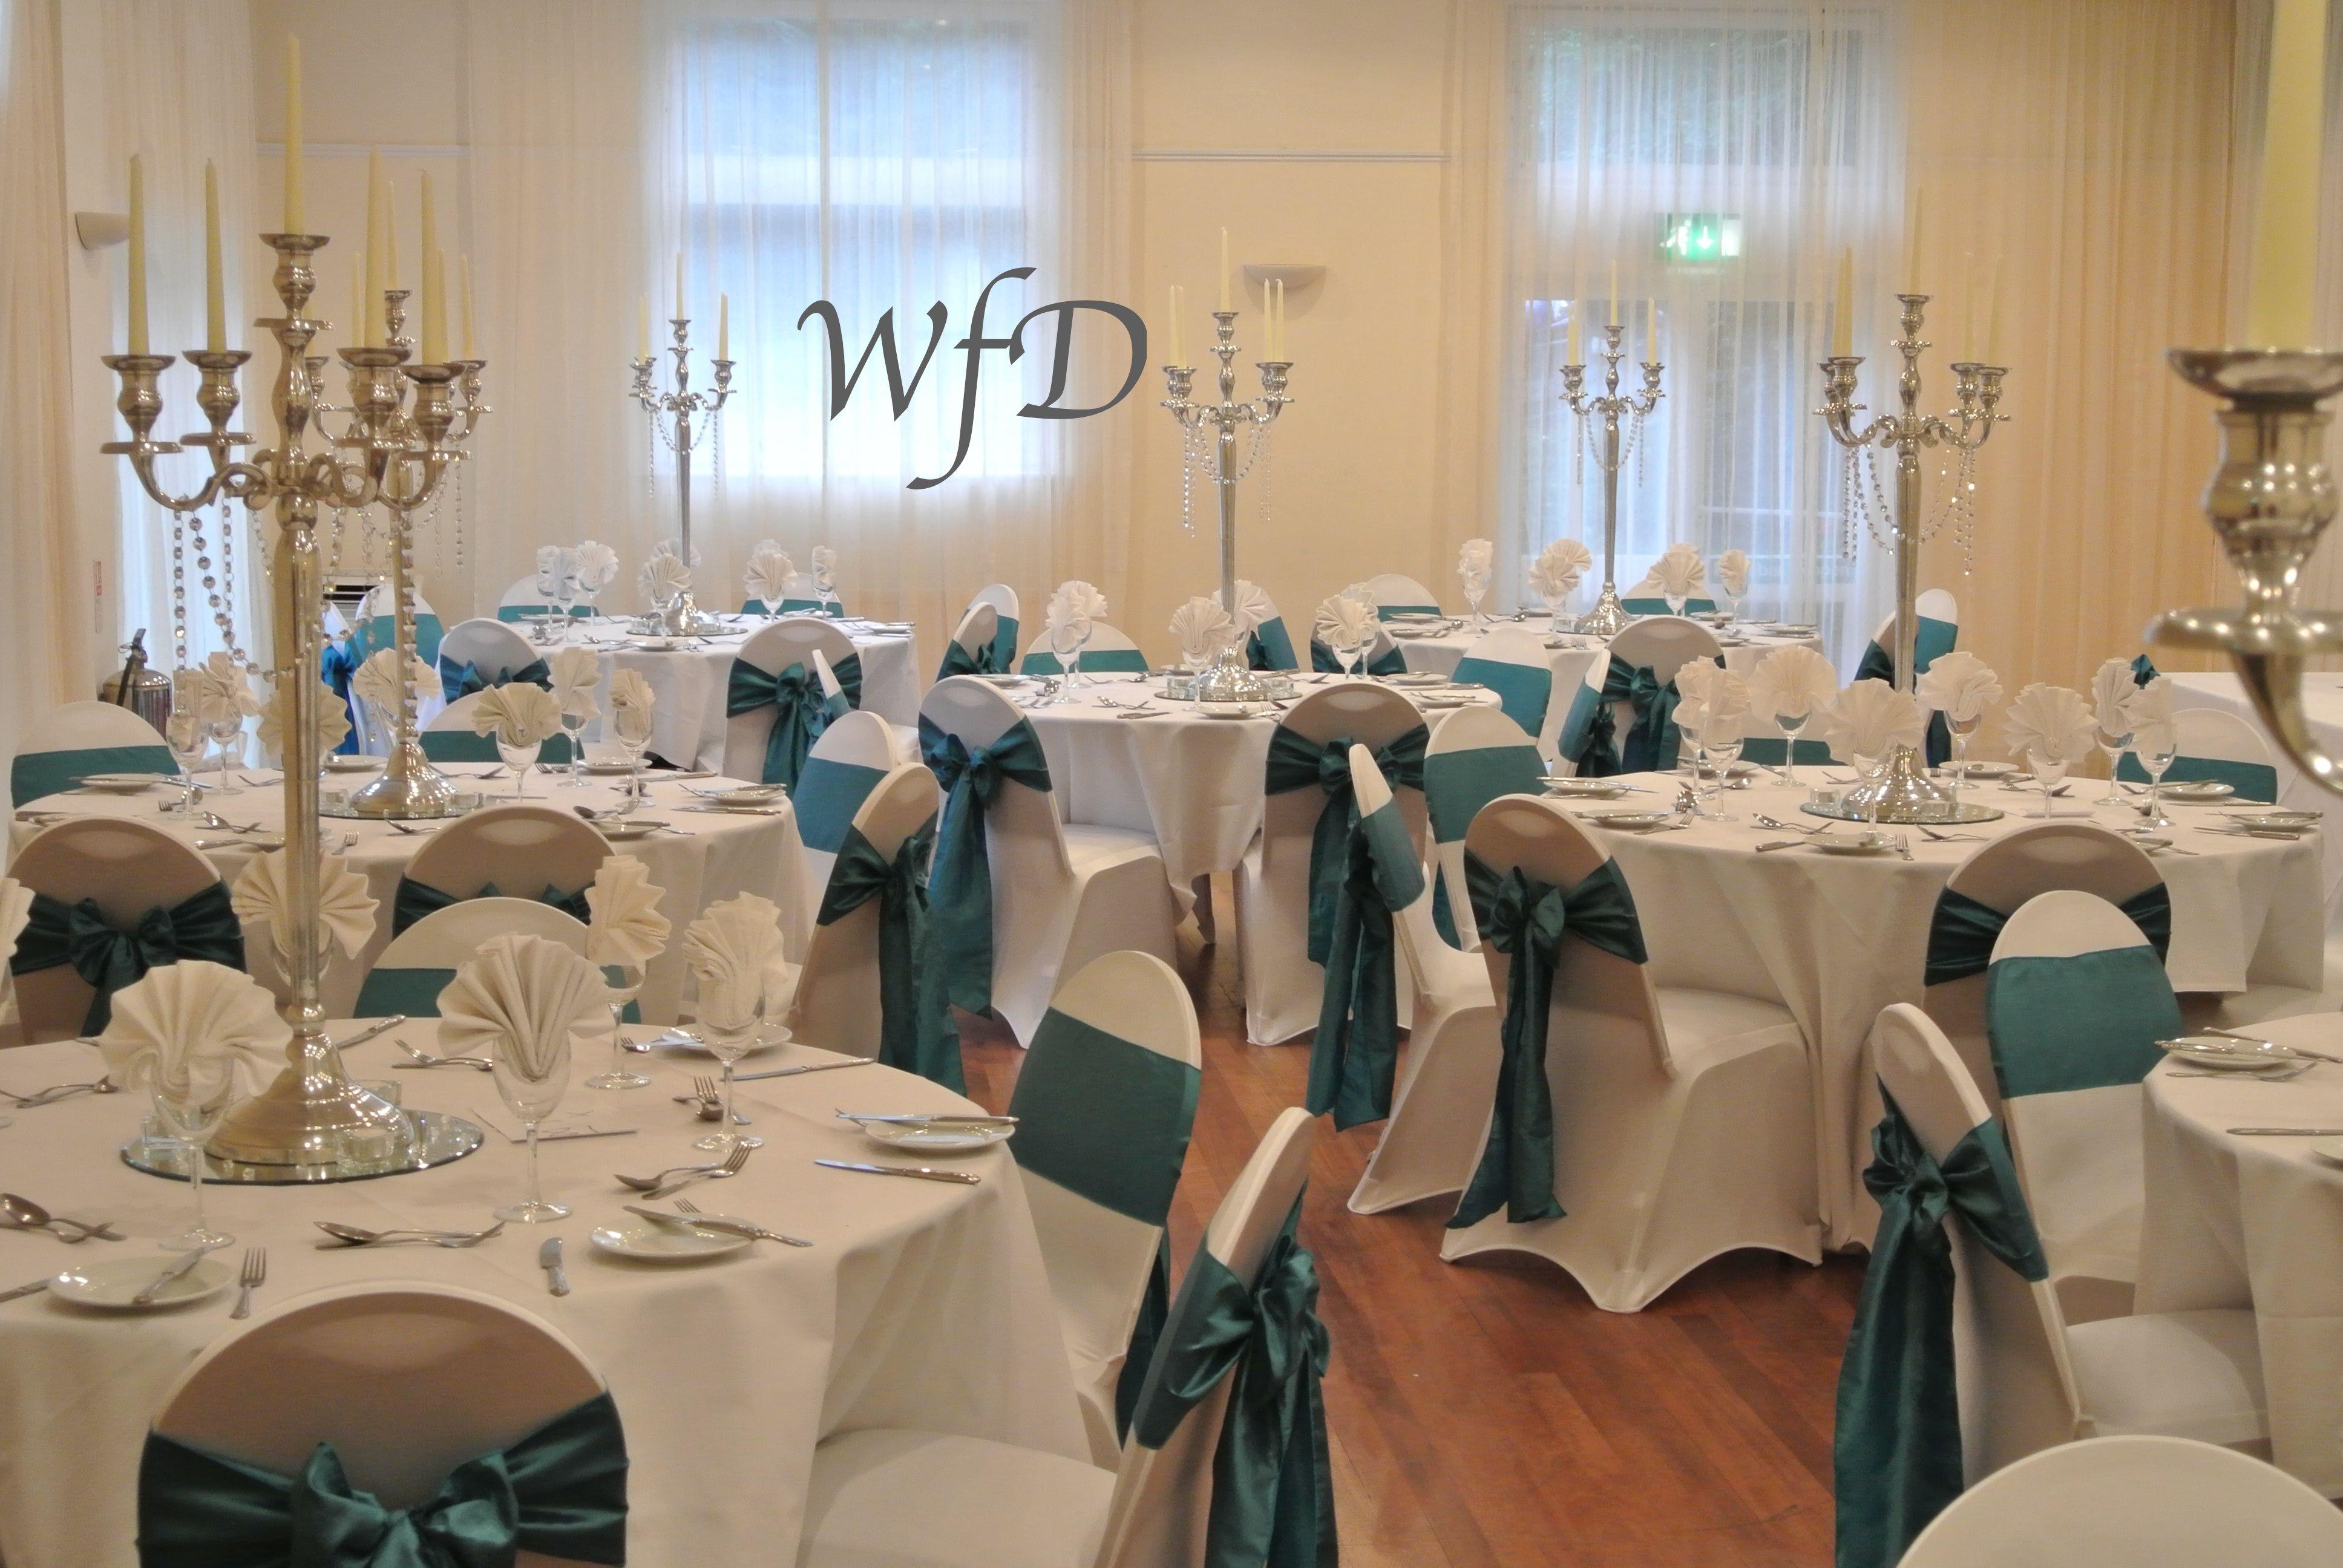 wedding chair covers devon cover rentals langley edgemoor hotel and sash hire candelabra